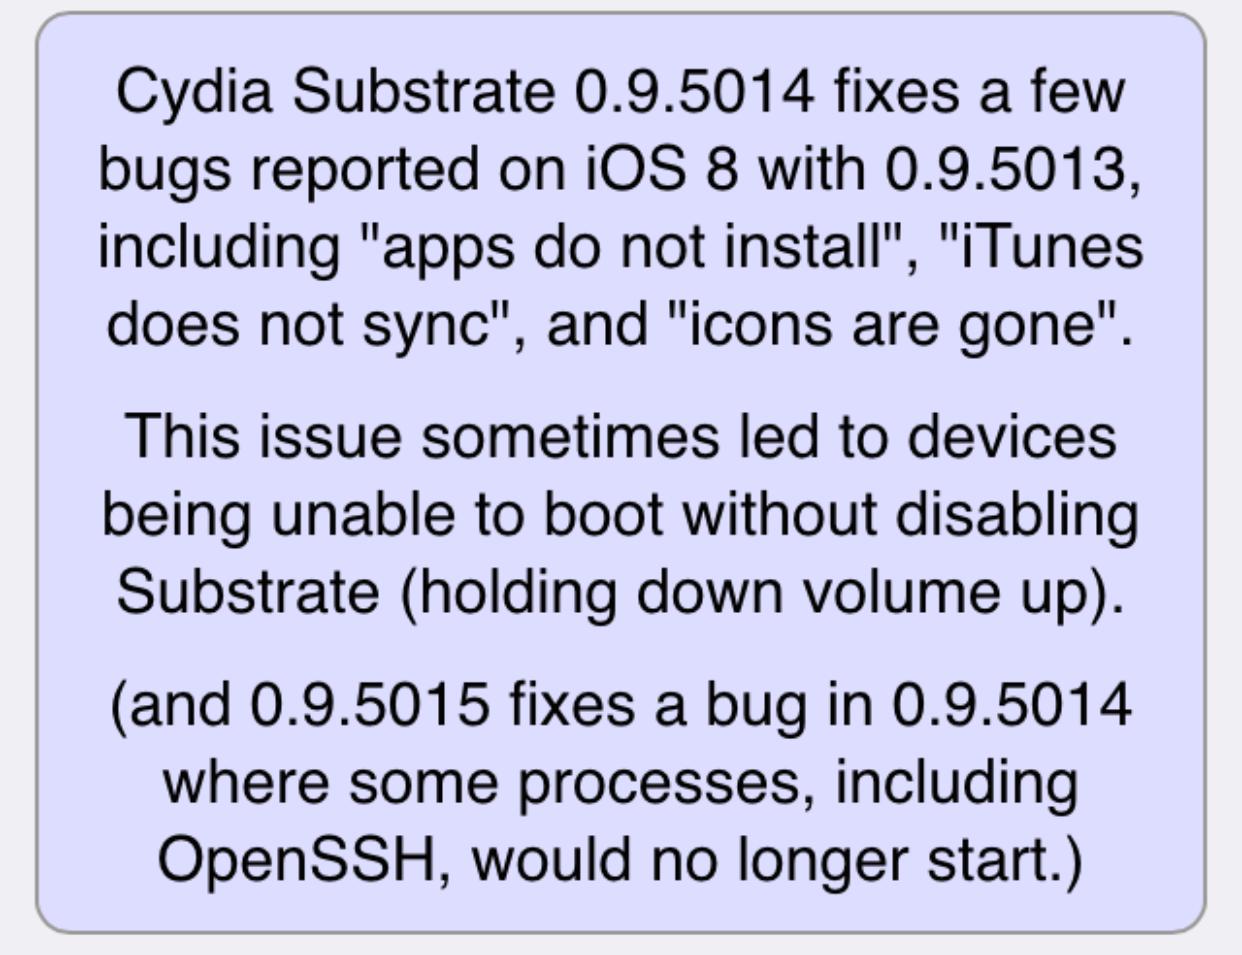 Cydia 0.9.5014 changelog